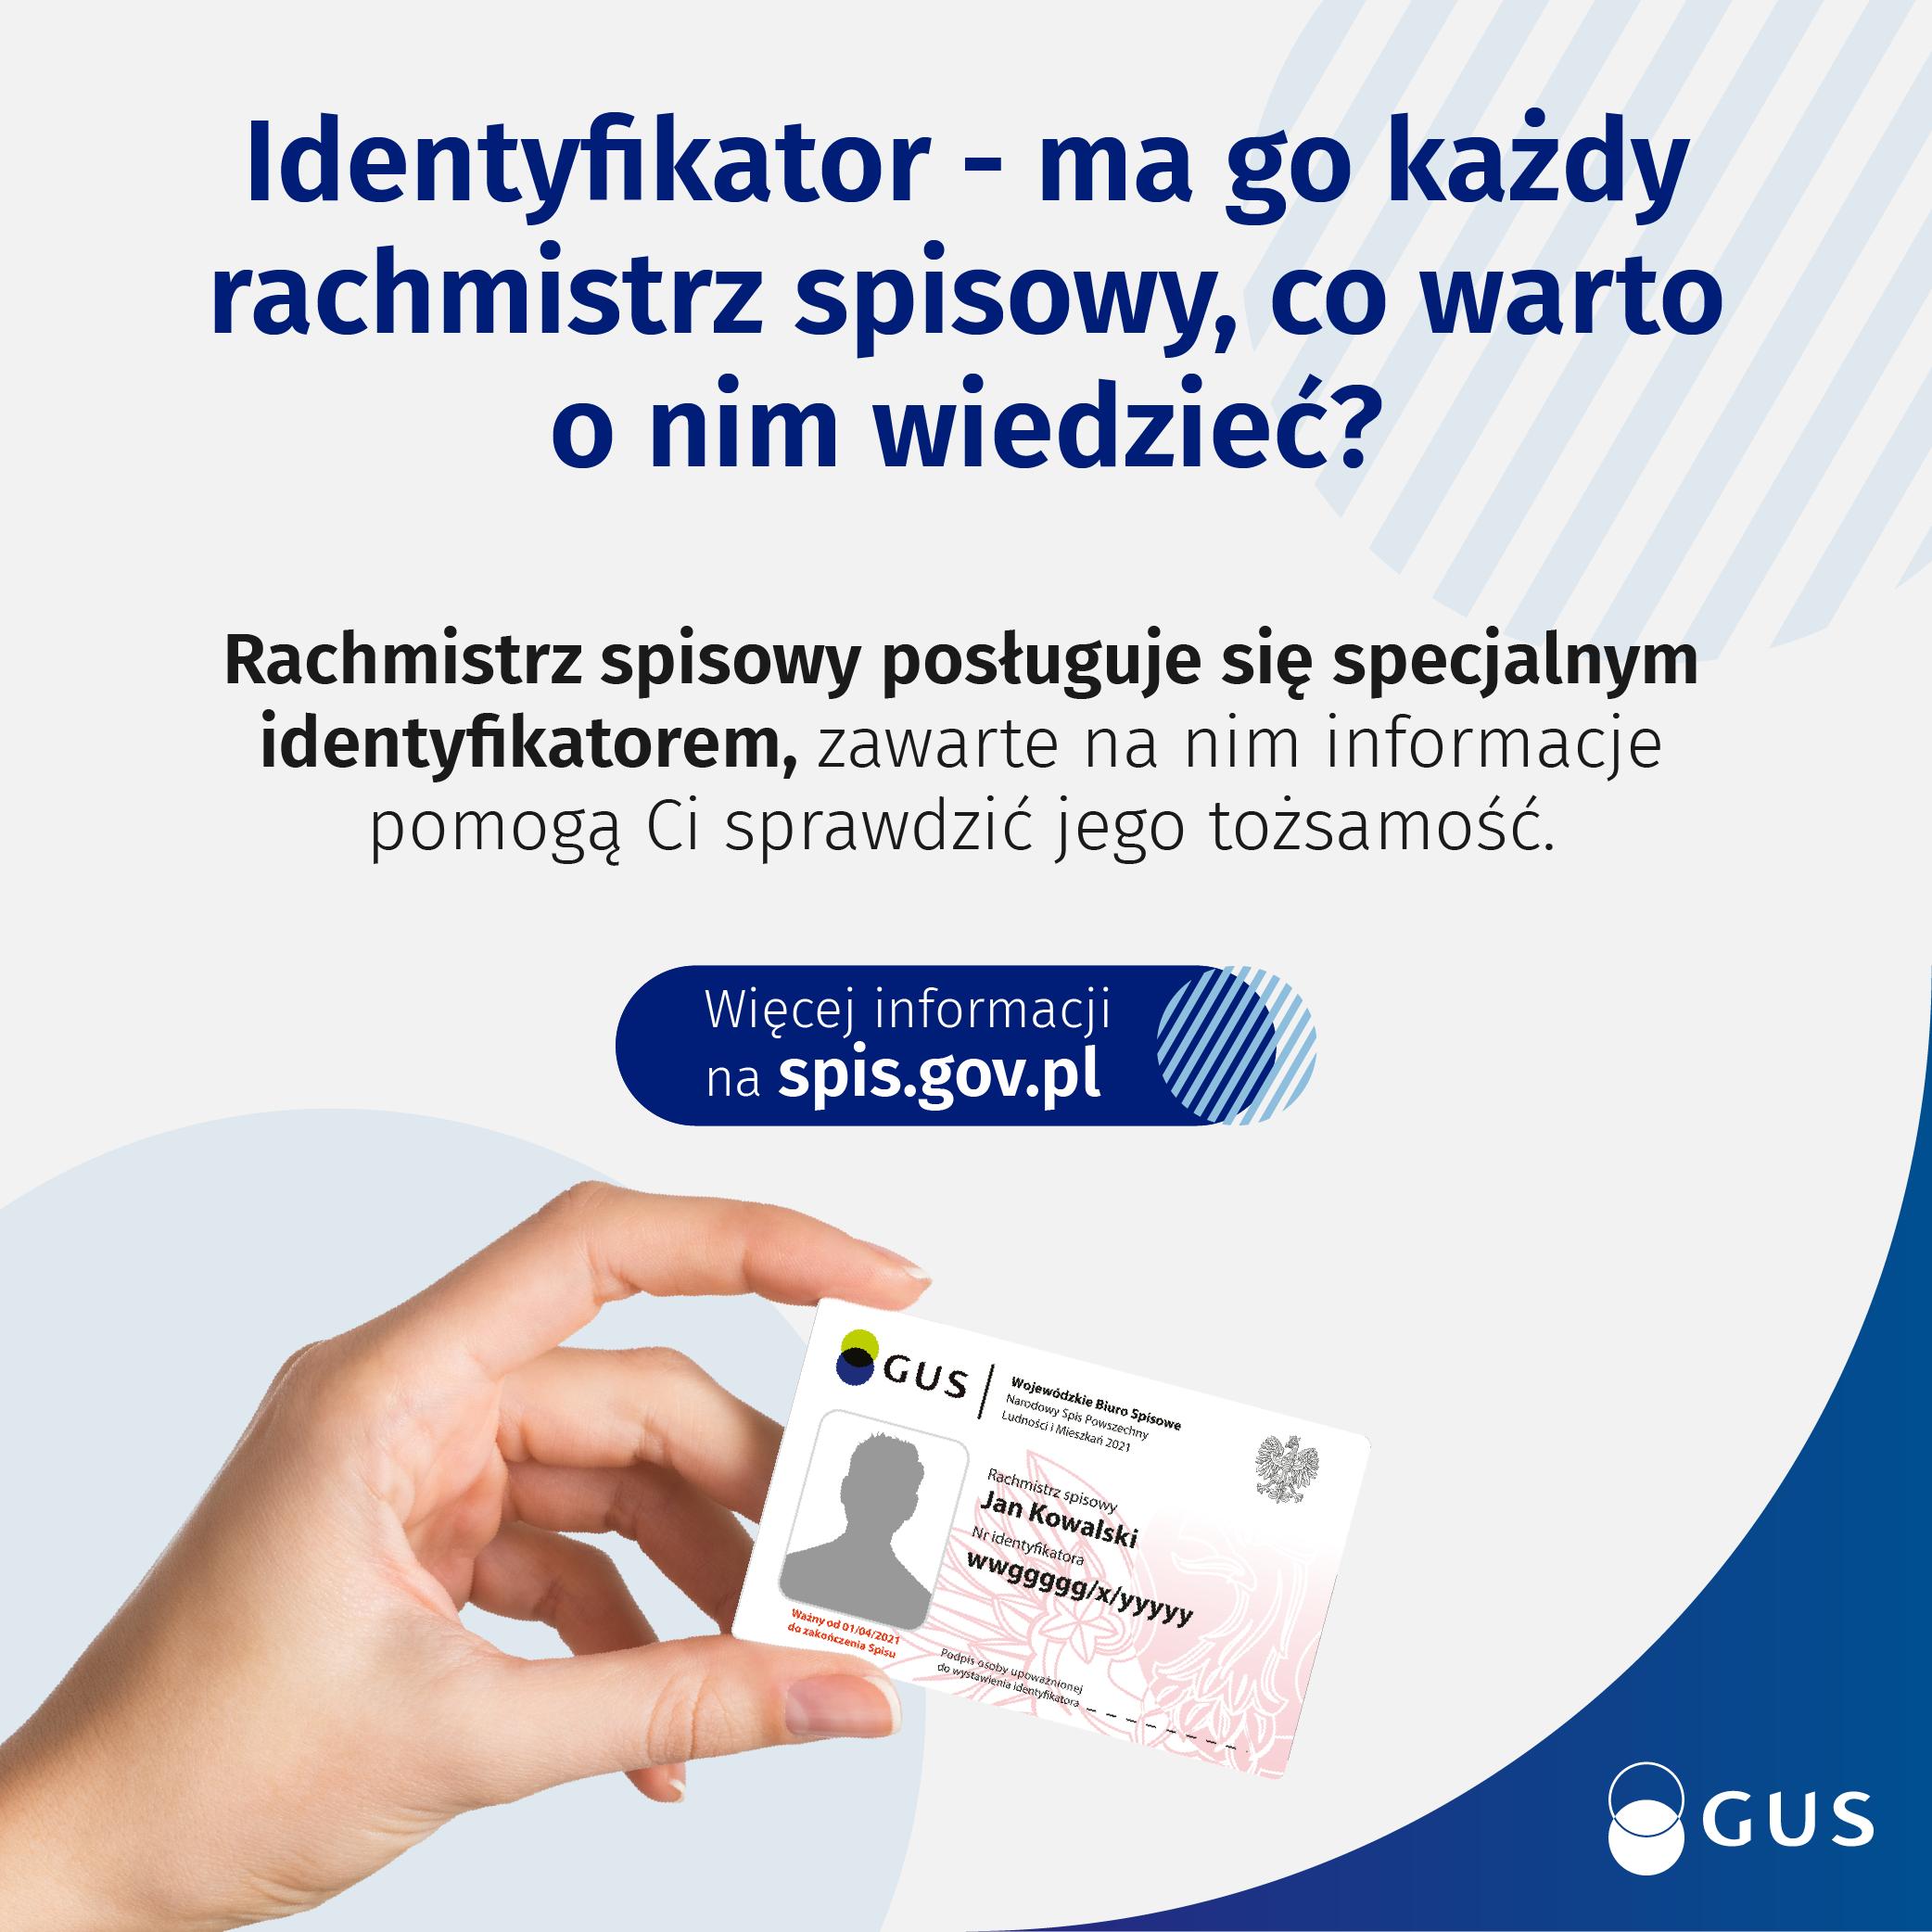 nsp-identyfikator insta.png (1.08 MB)